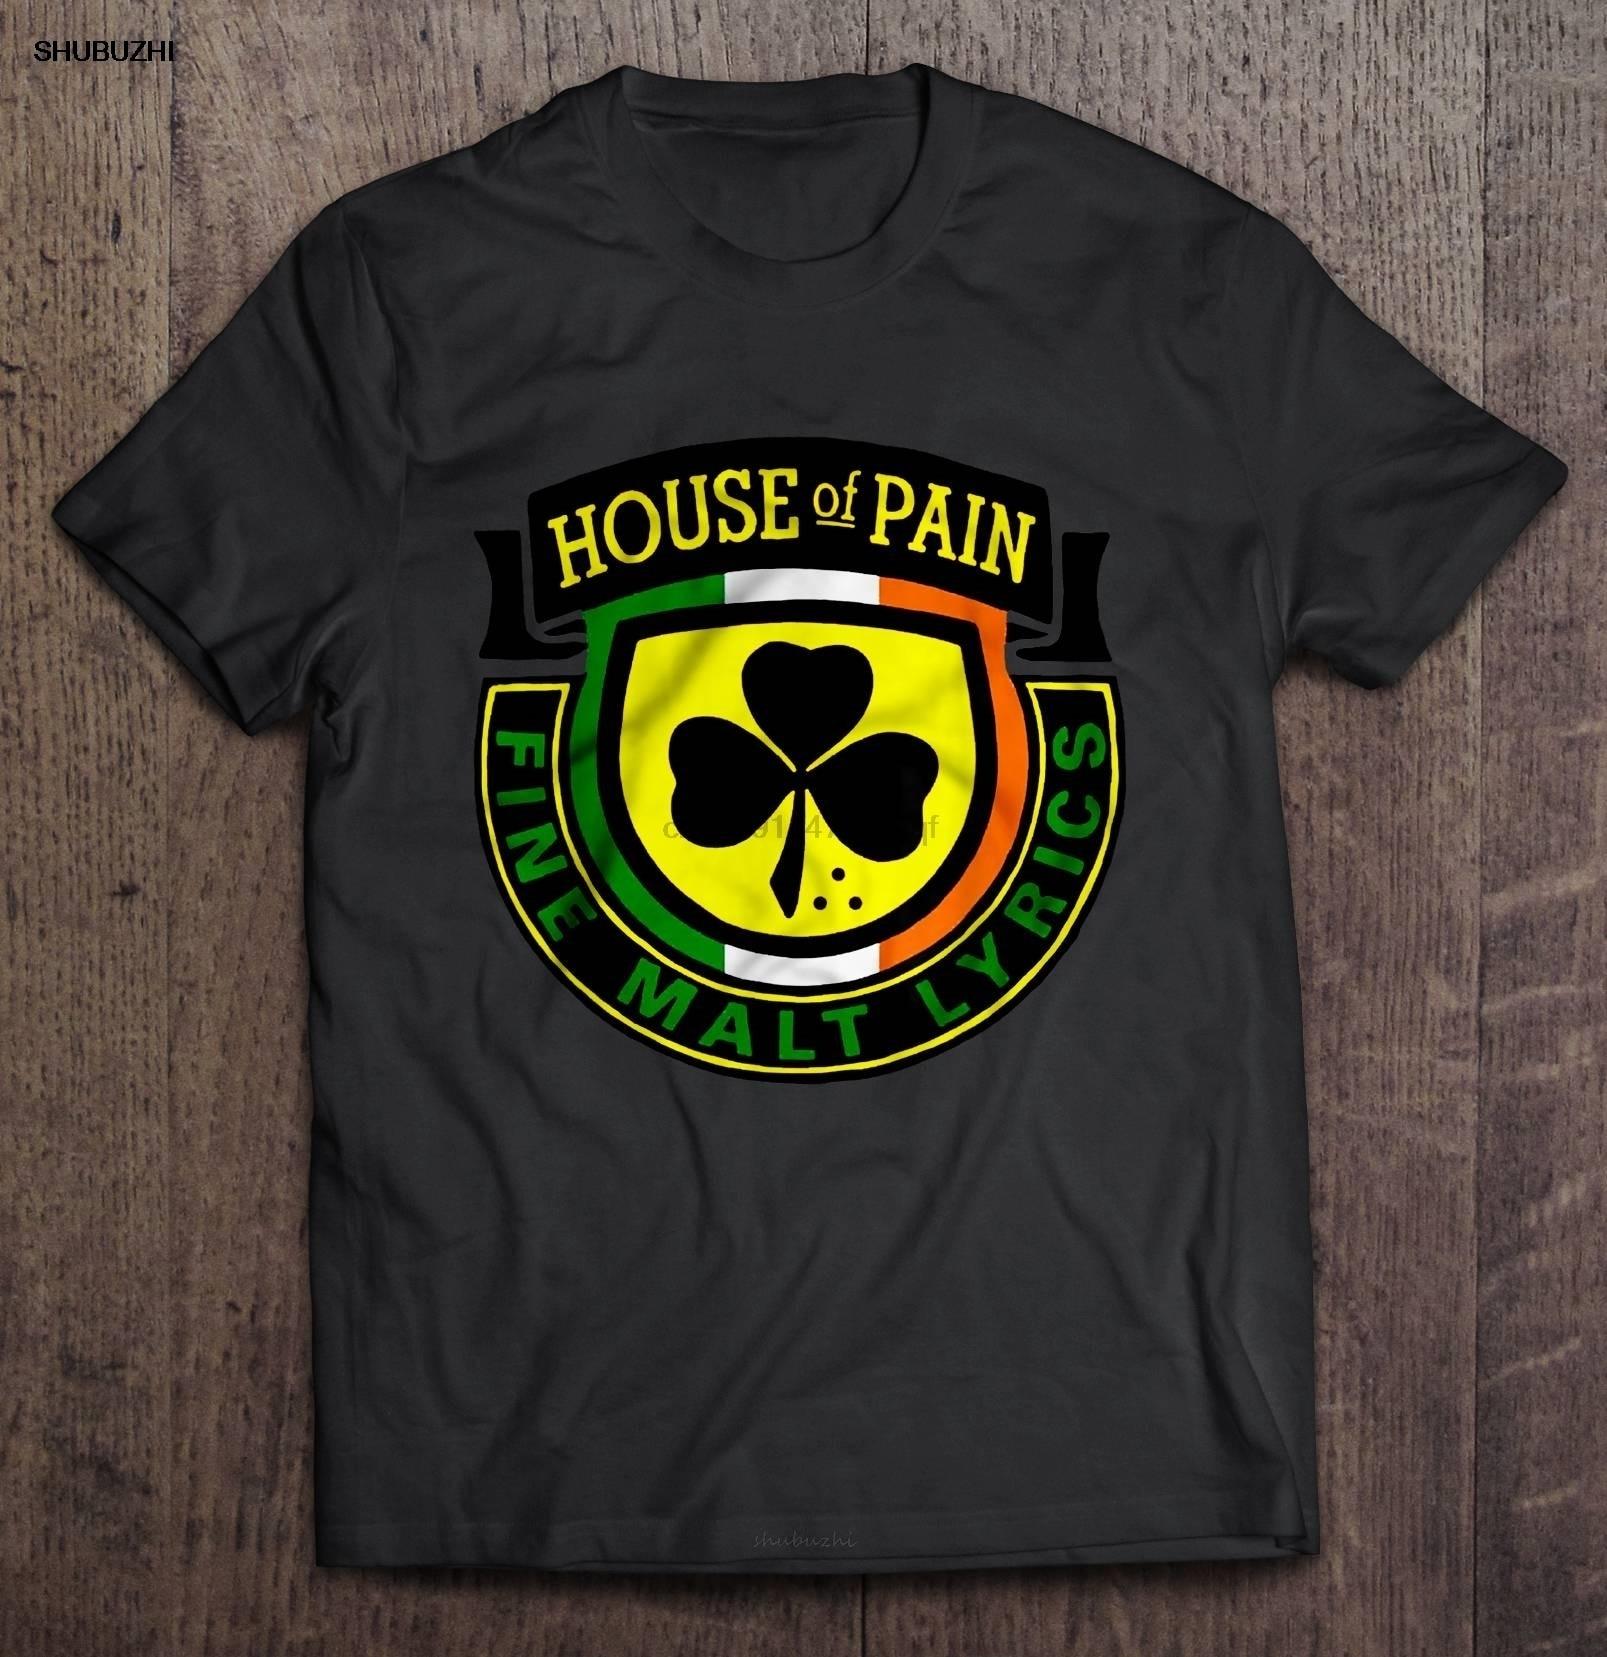 Camiseta divertida a la moda para hombre, camiseta con letras de Malta fina para casa del dolor, Camiseta de algodón para mujer, camiseta a la moda de verano para hombre, talla europea